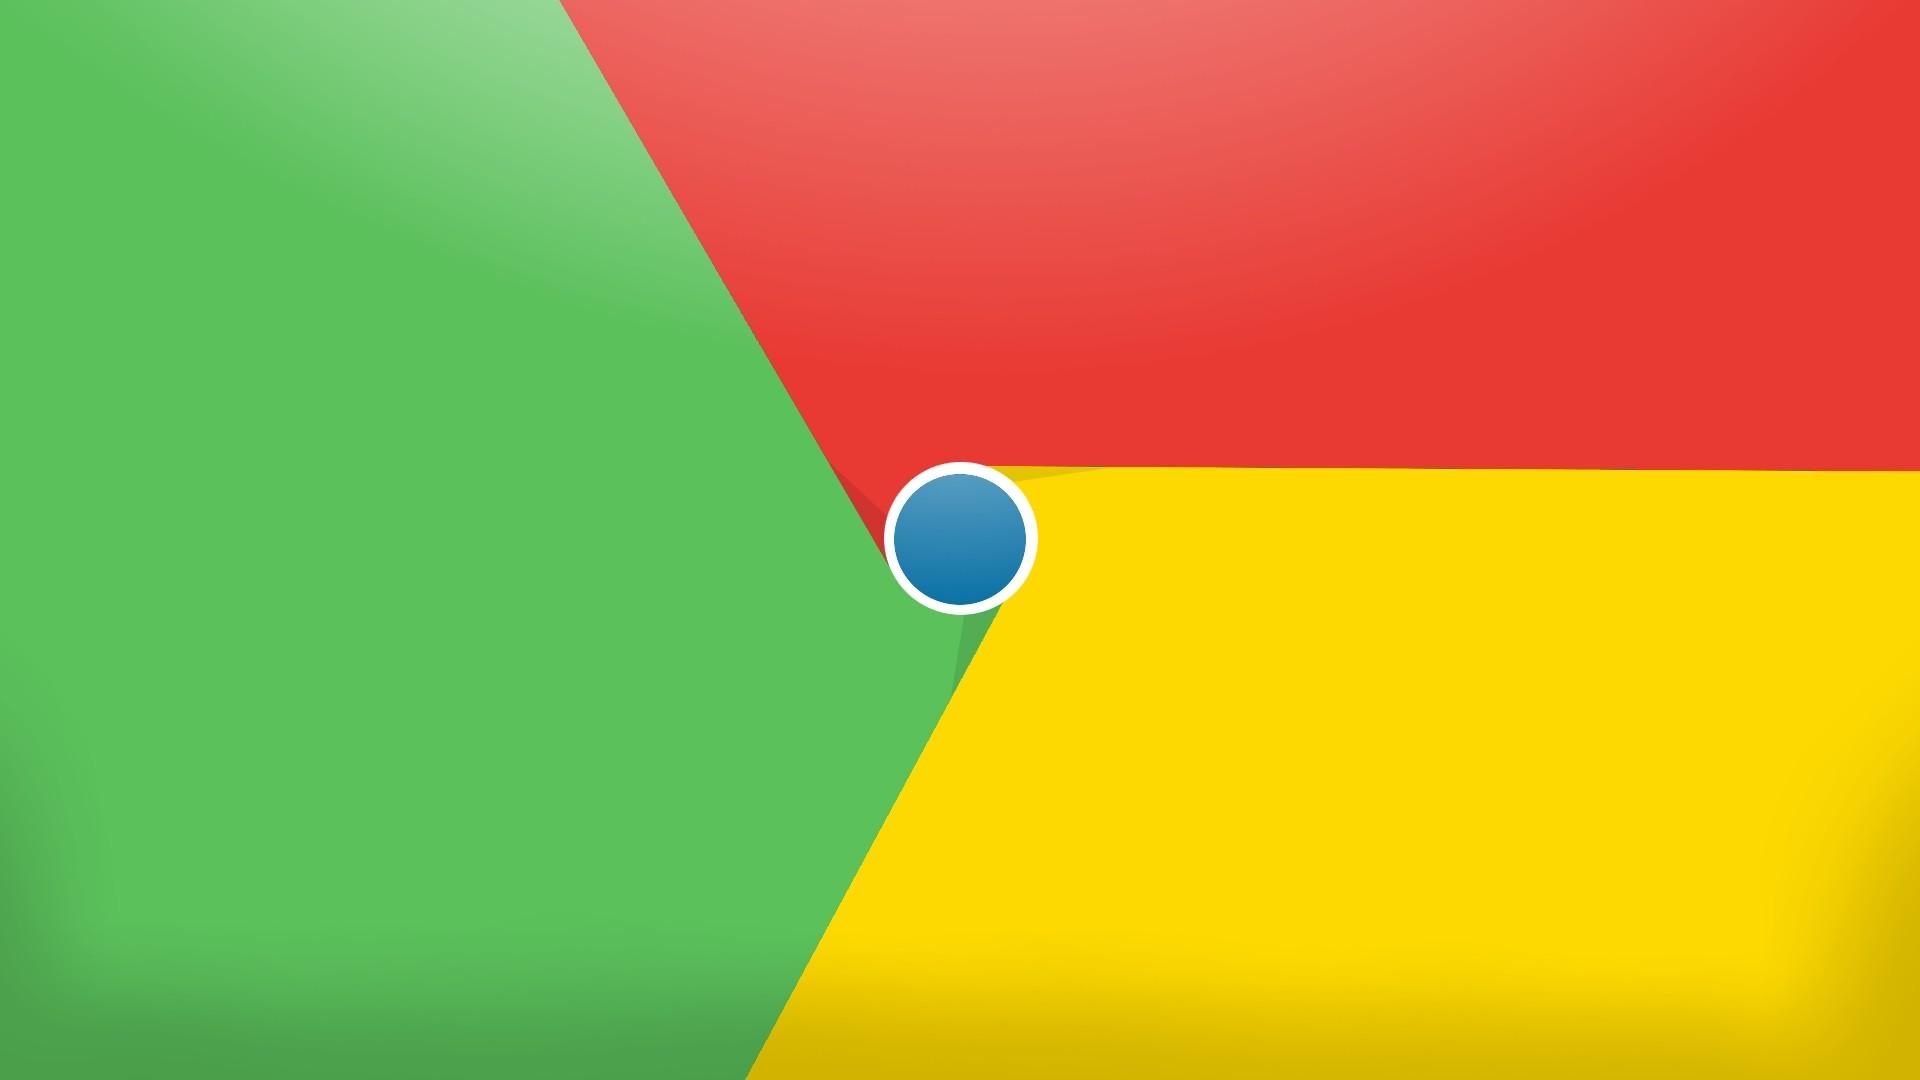 Chrome Download Wallpaper